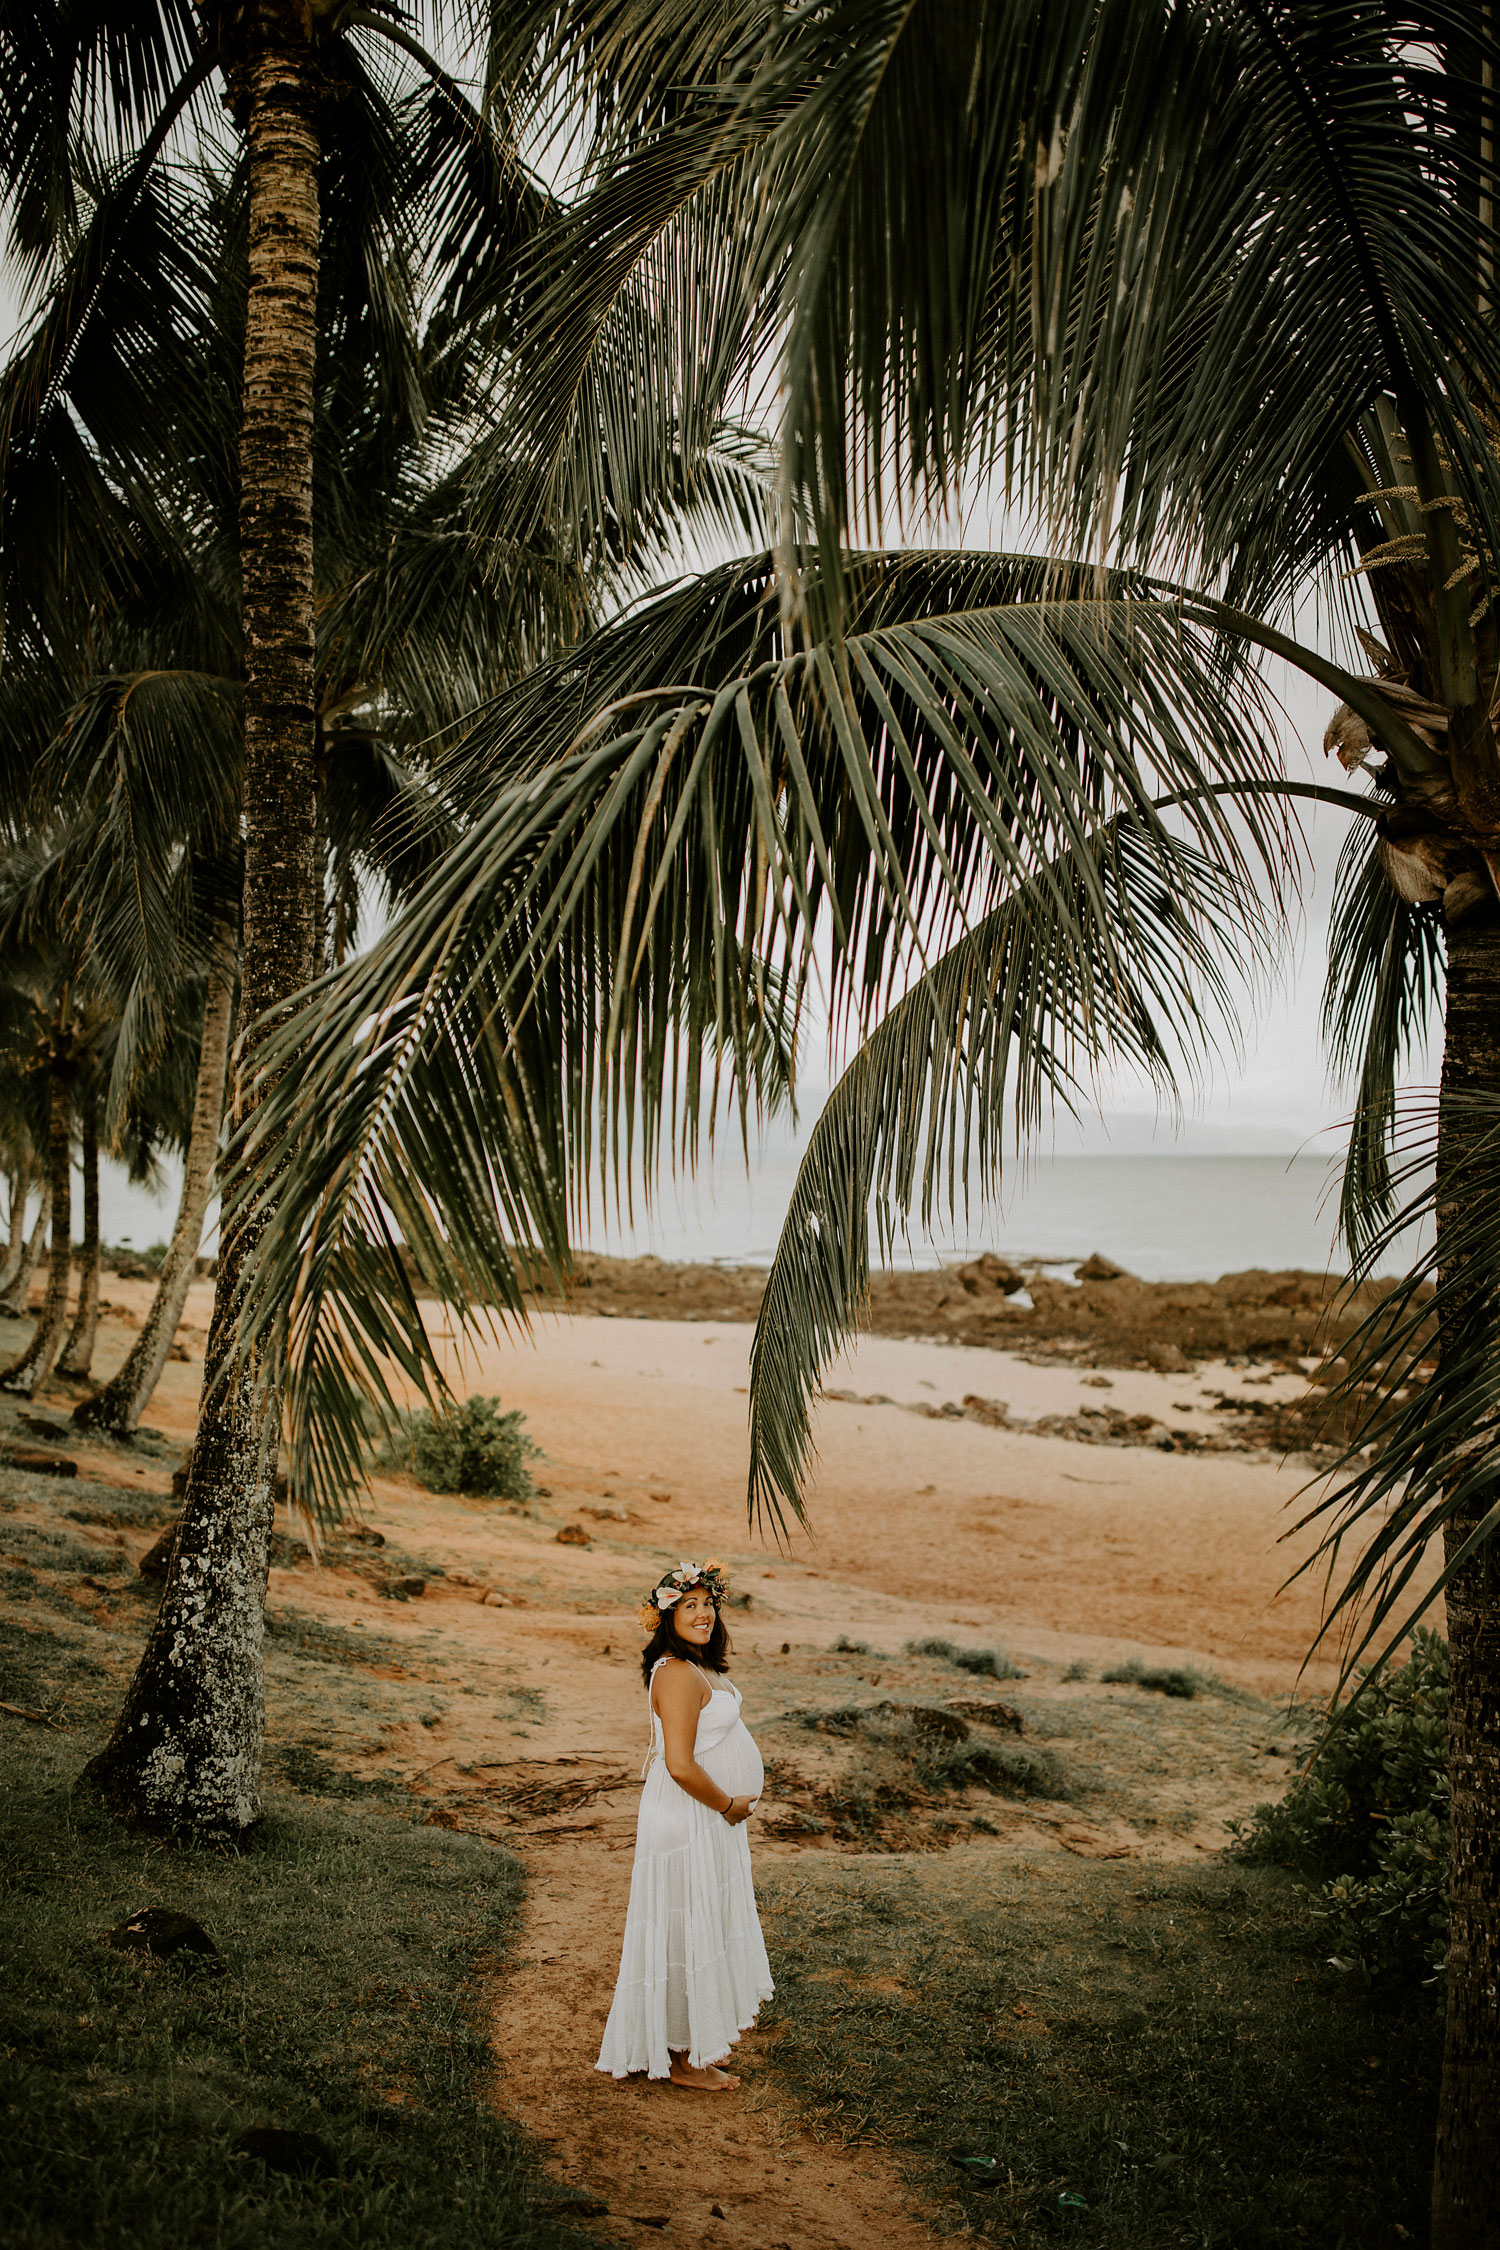 Hawaii-Underwater-maternity-photography-01.jpg